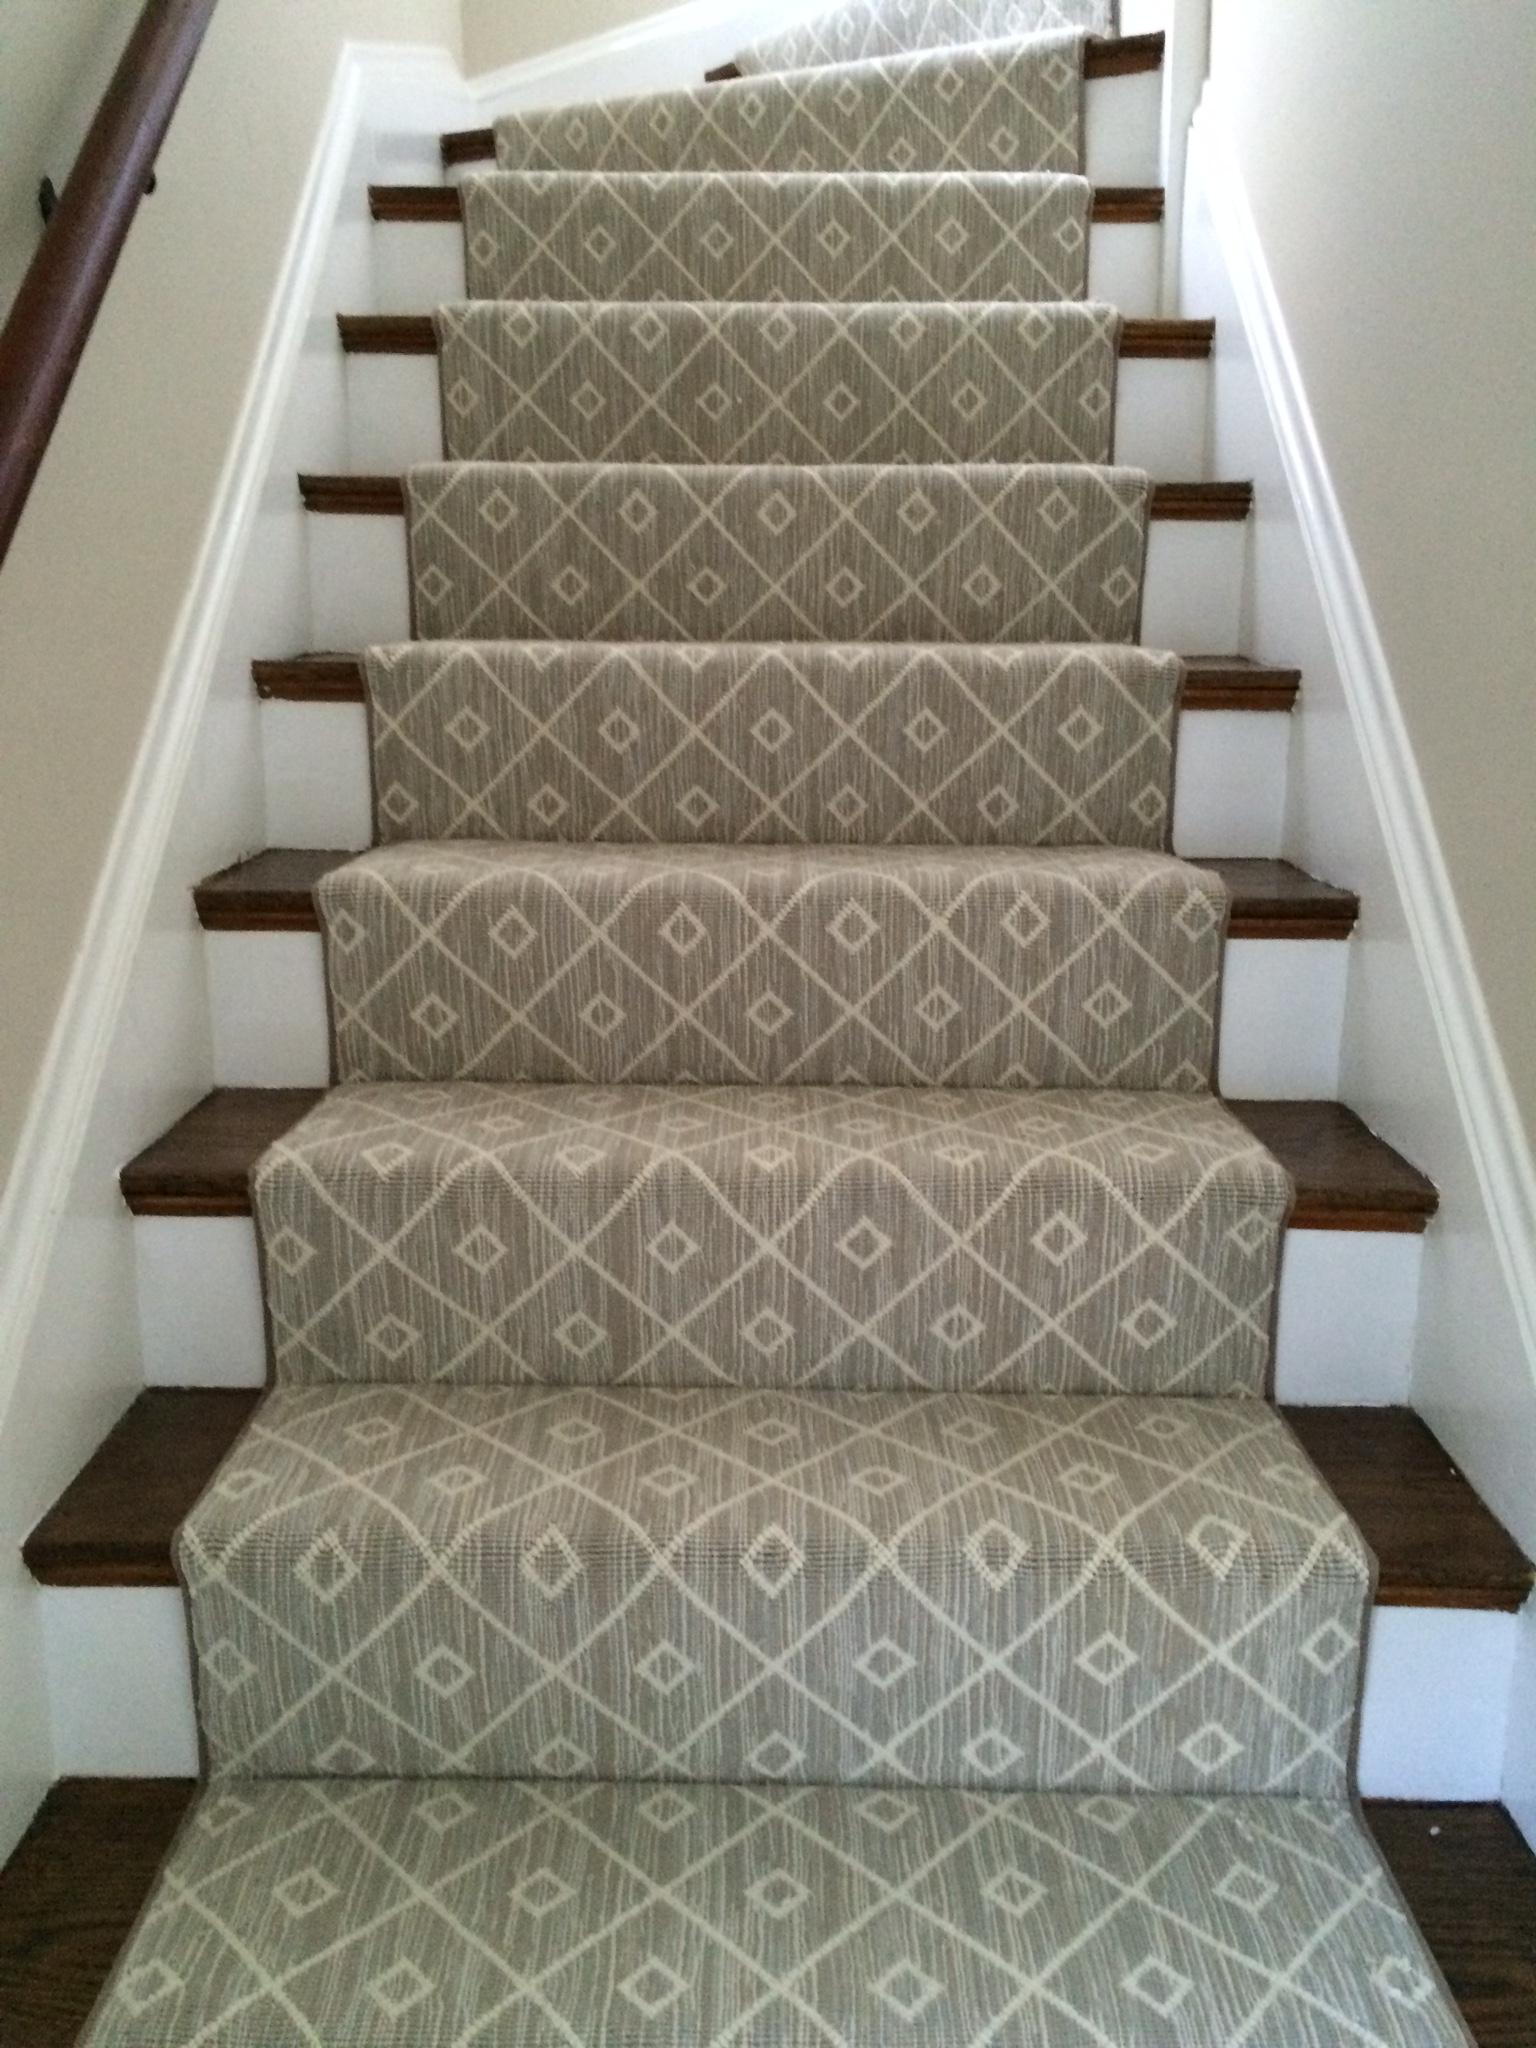 Carpet stairs striped stair carpet stair mats stair tread rugs EAKIODQ